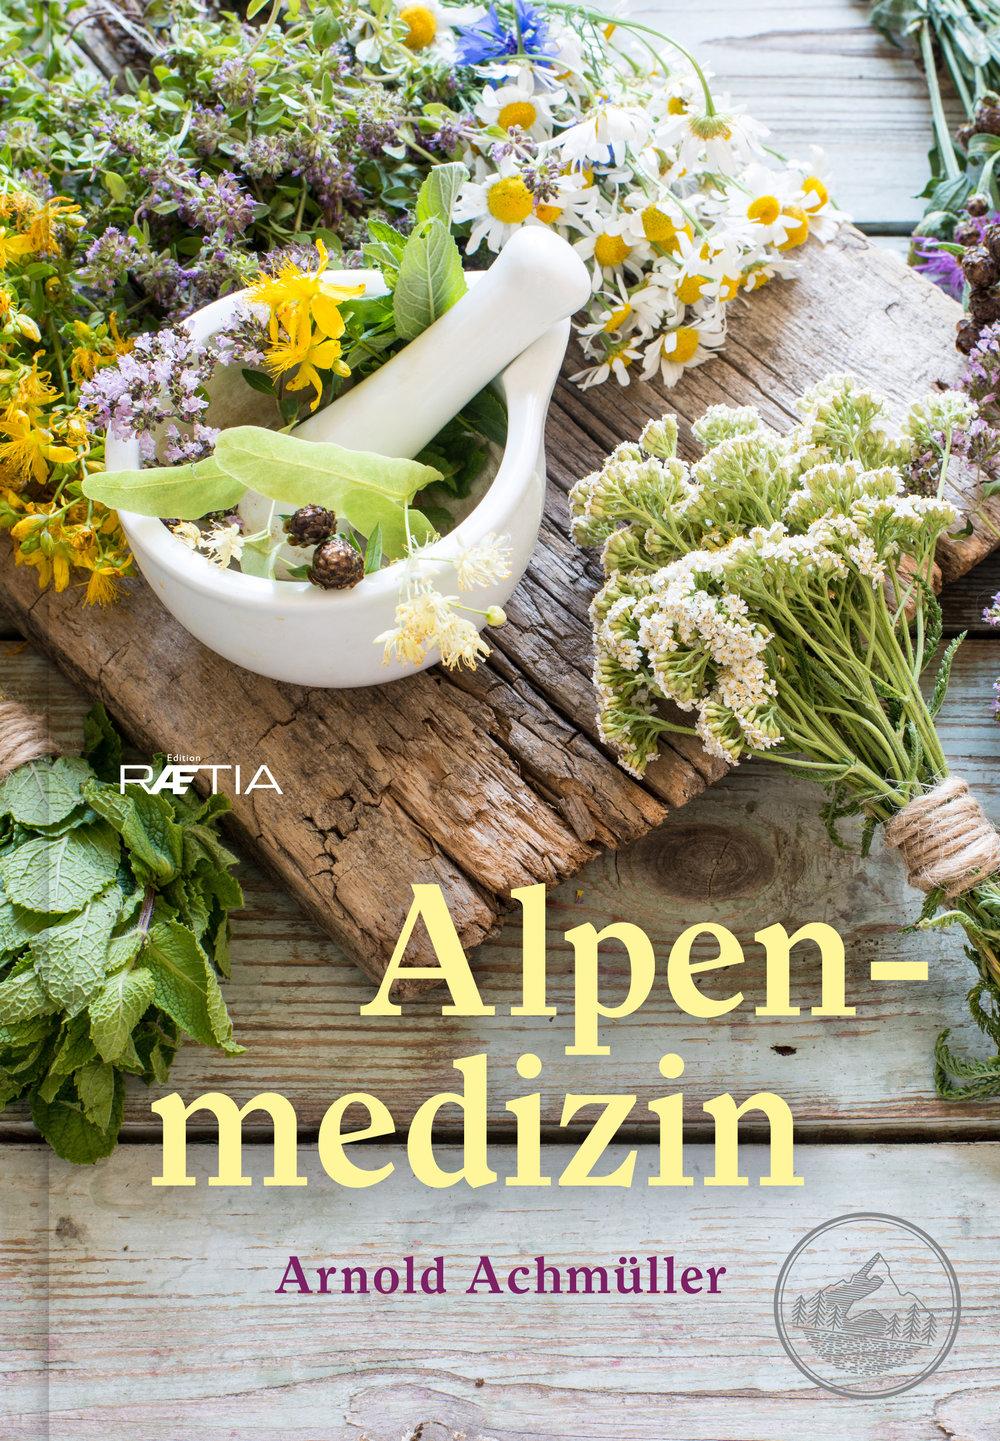 Achmueller-Arnold-Alpenmedizin_Cover.jpg